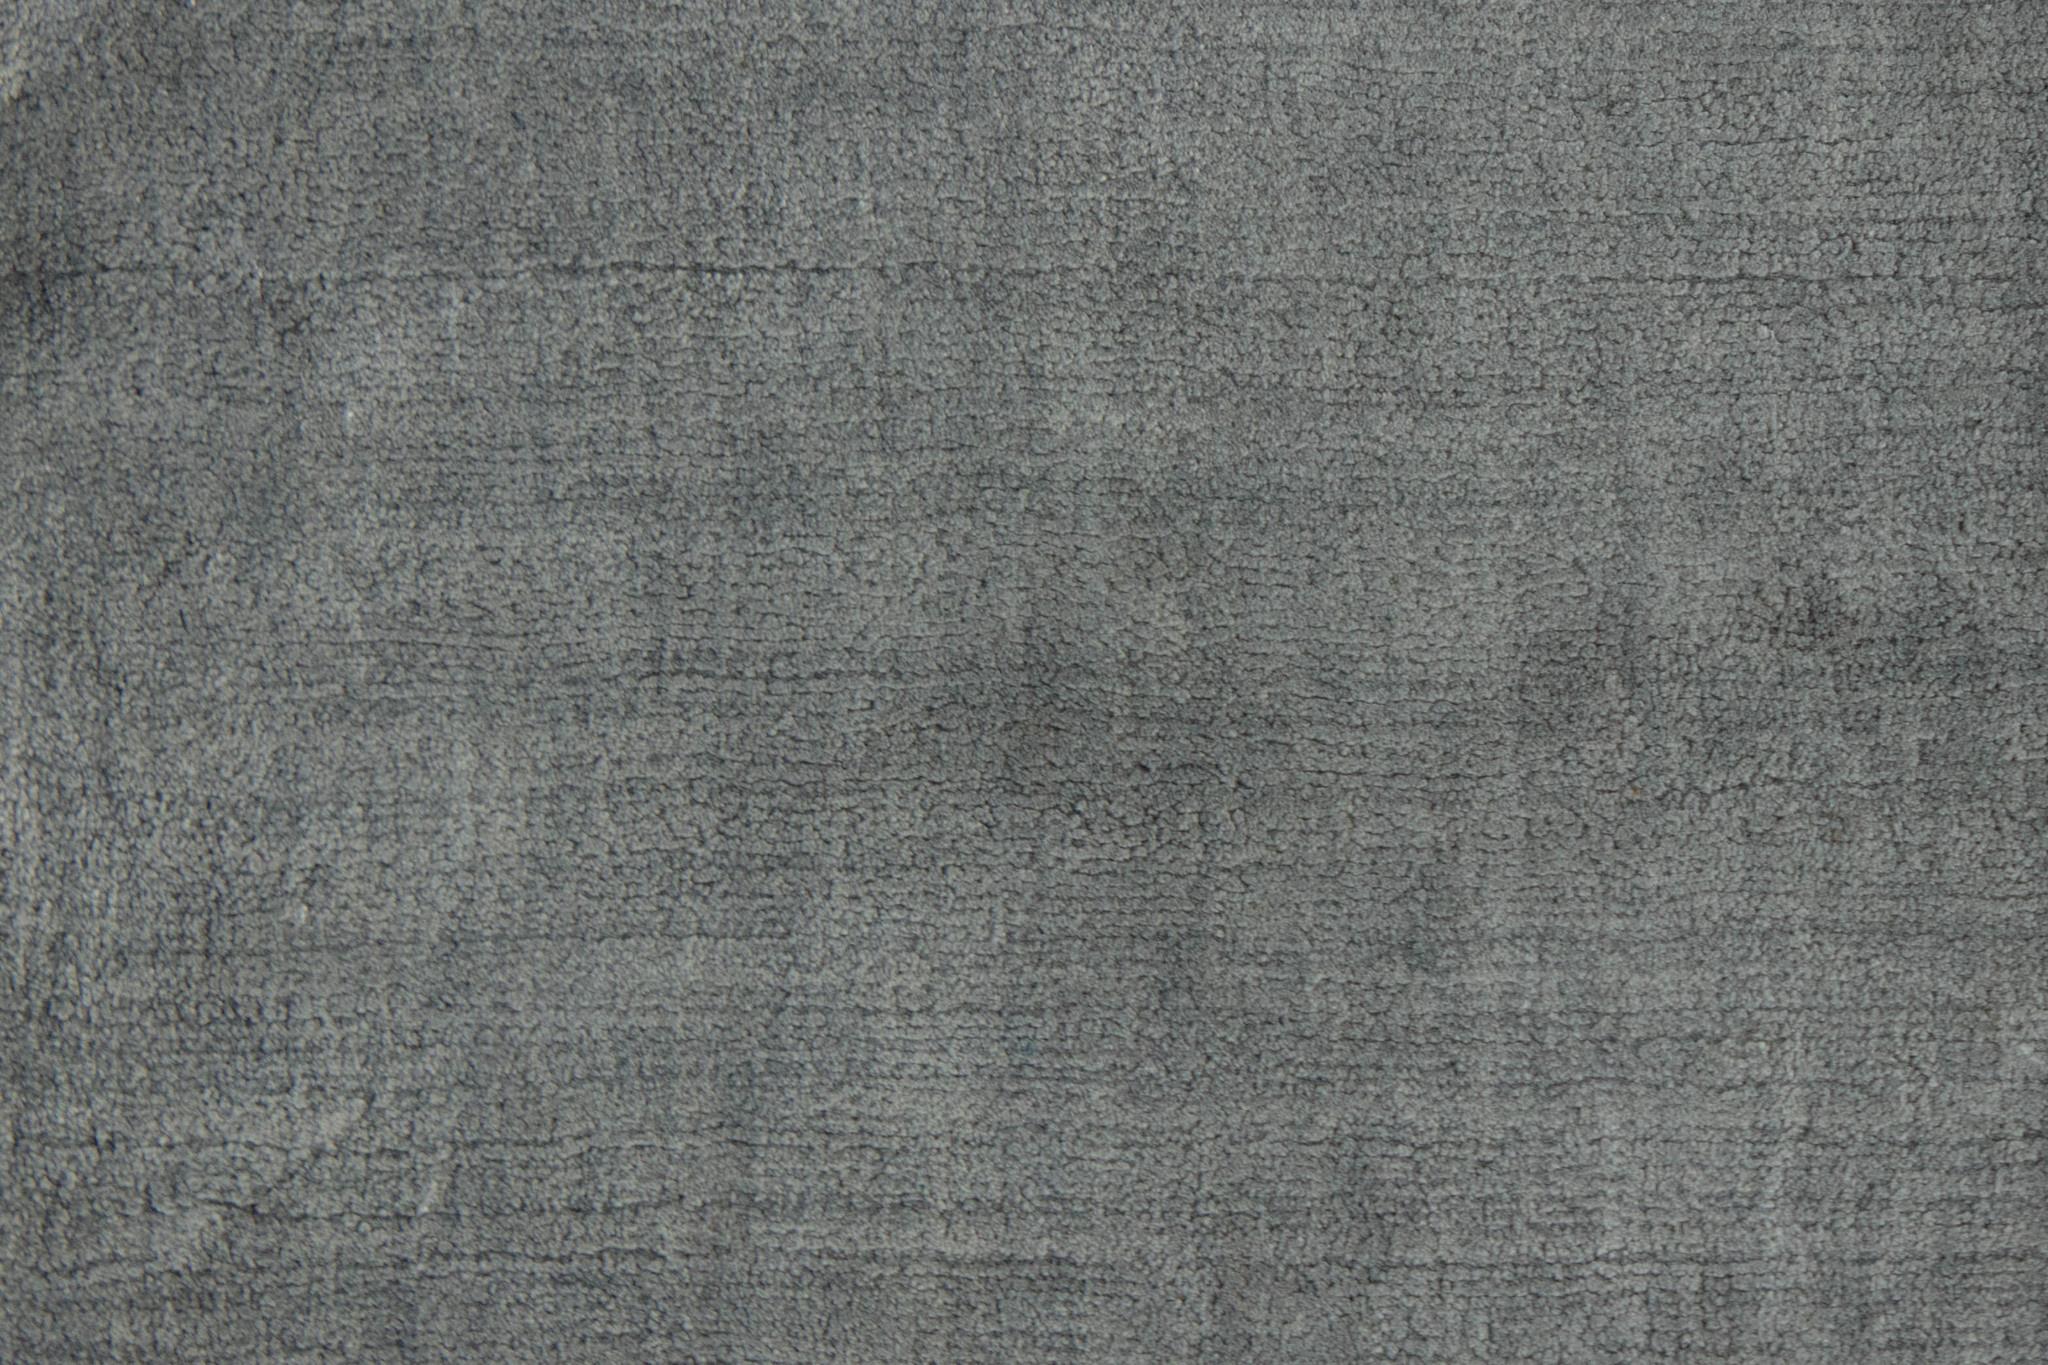 CHIANTI Carpet Steel Grey 200x300-1